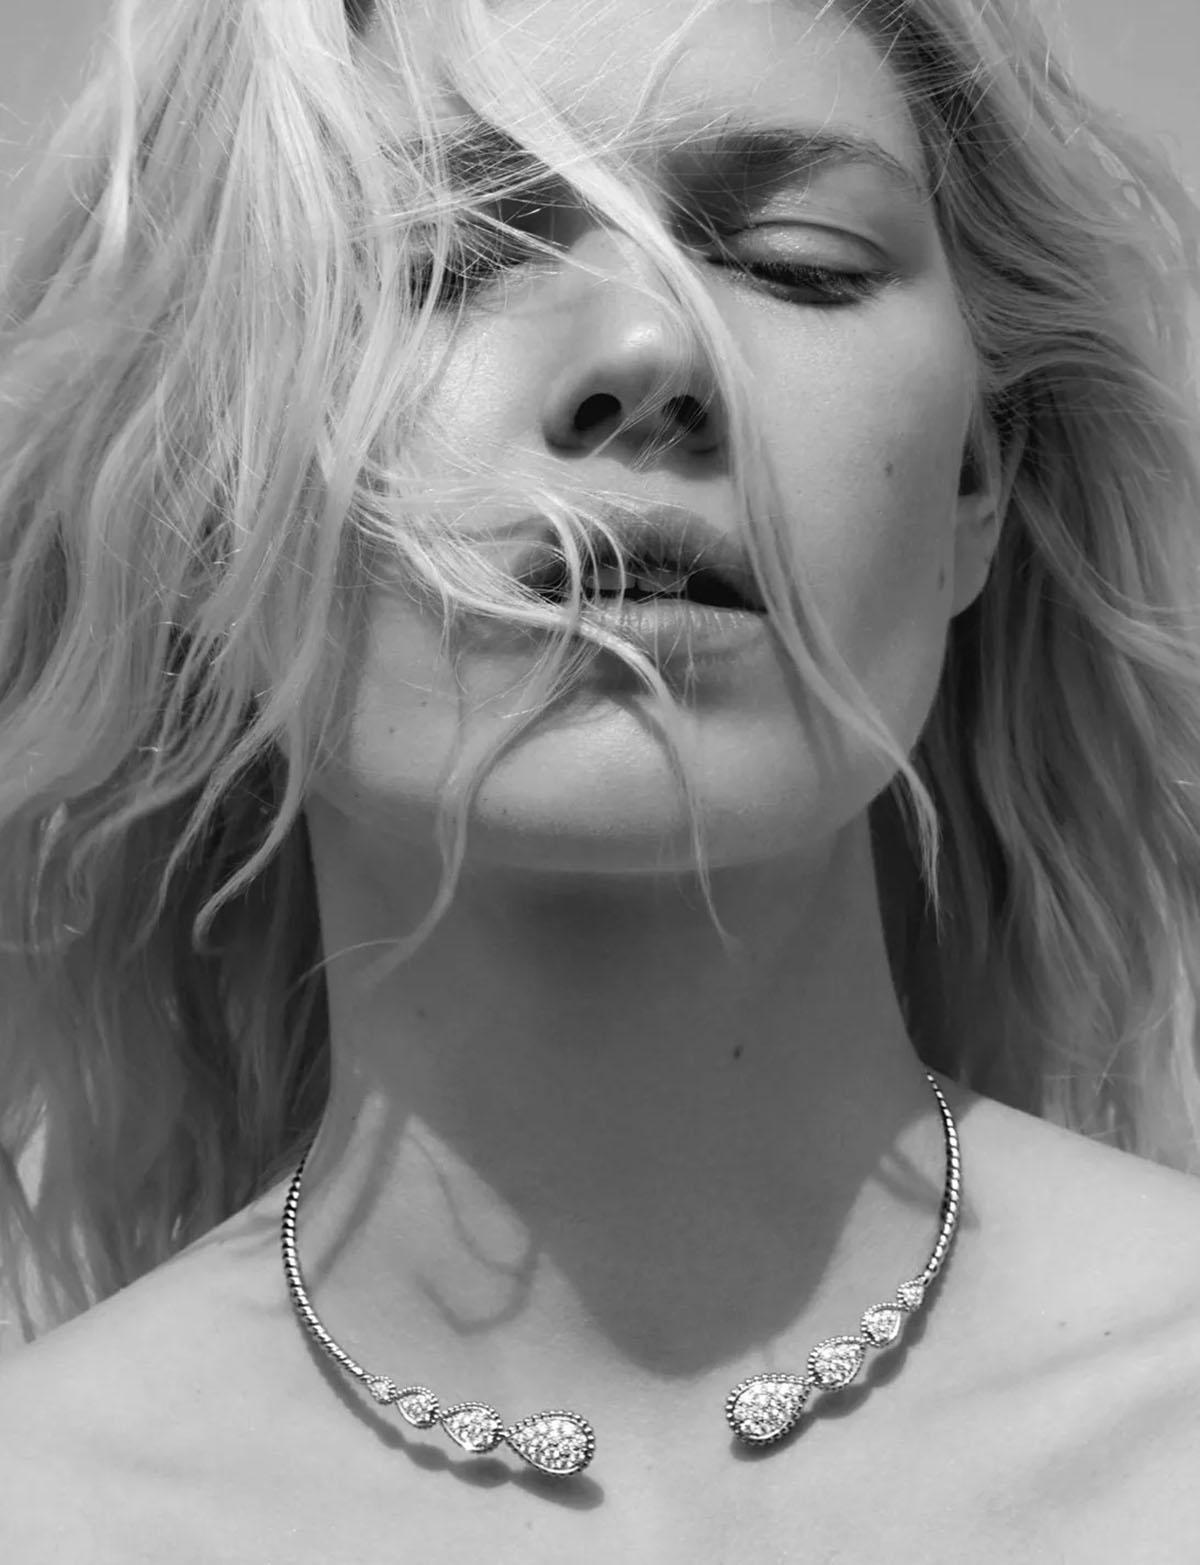 Ola Rudnicka by Sabine Villiard for Madame Figaro June 4th, 2021